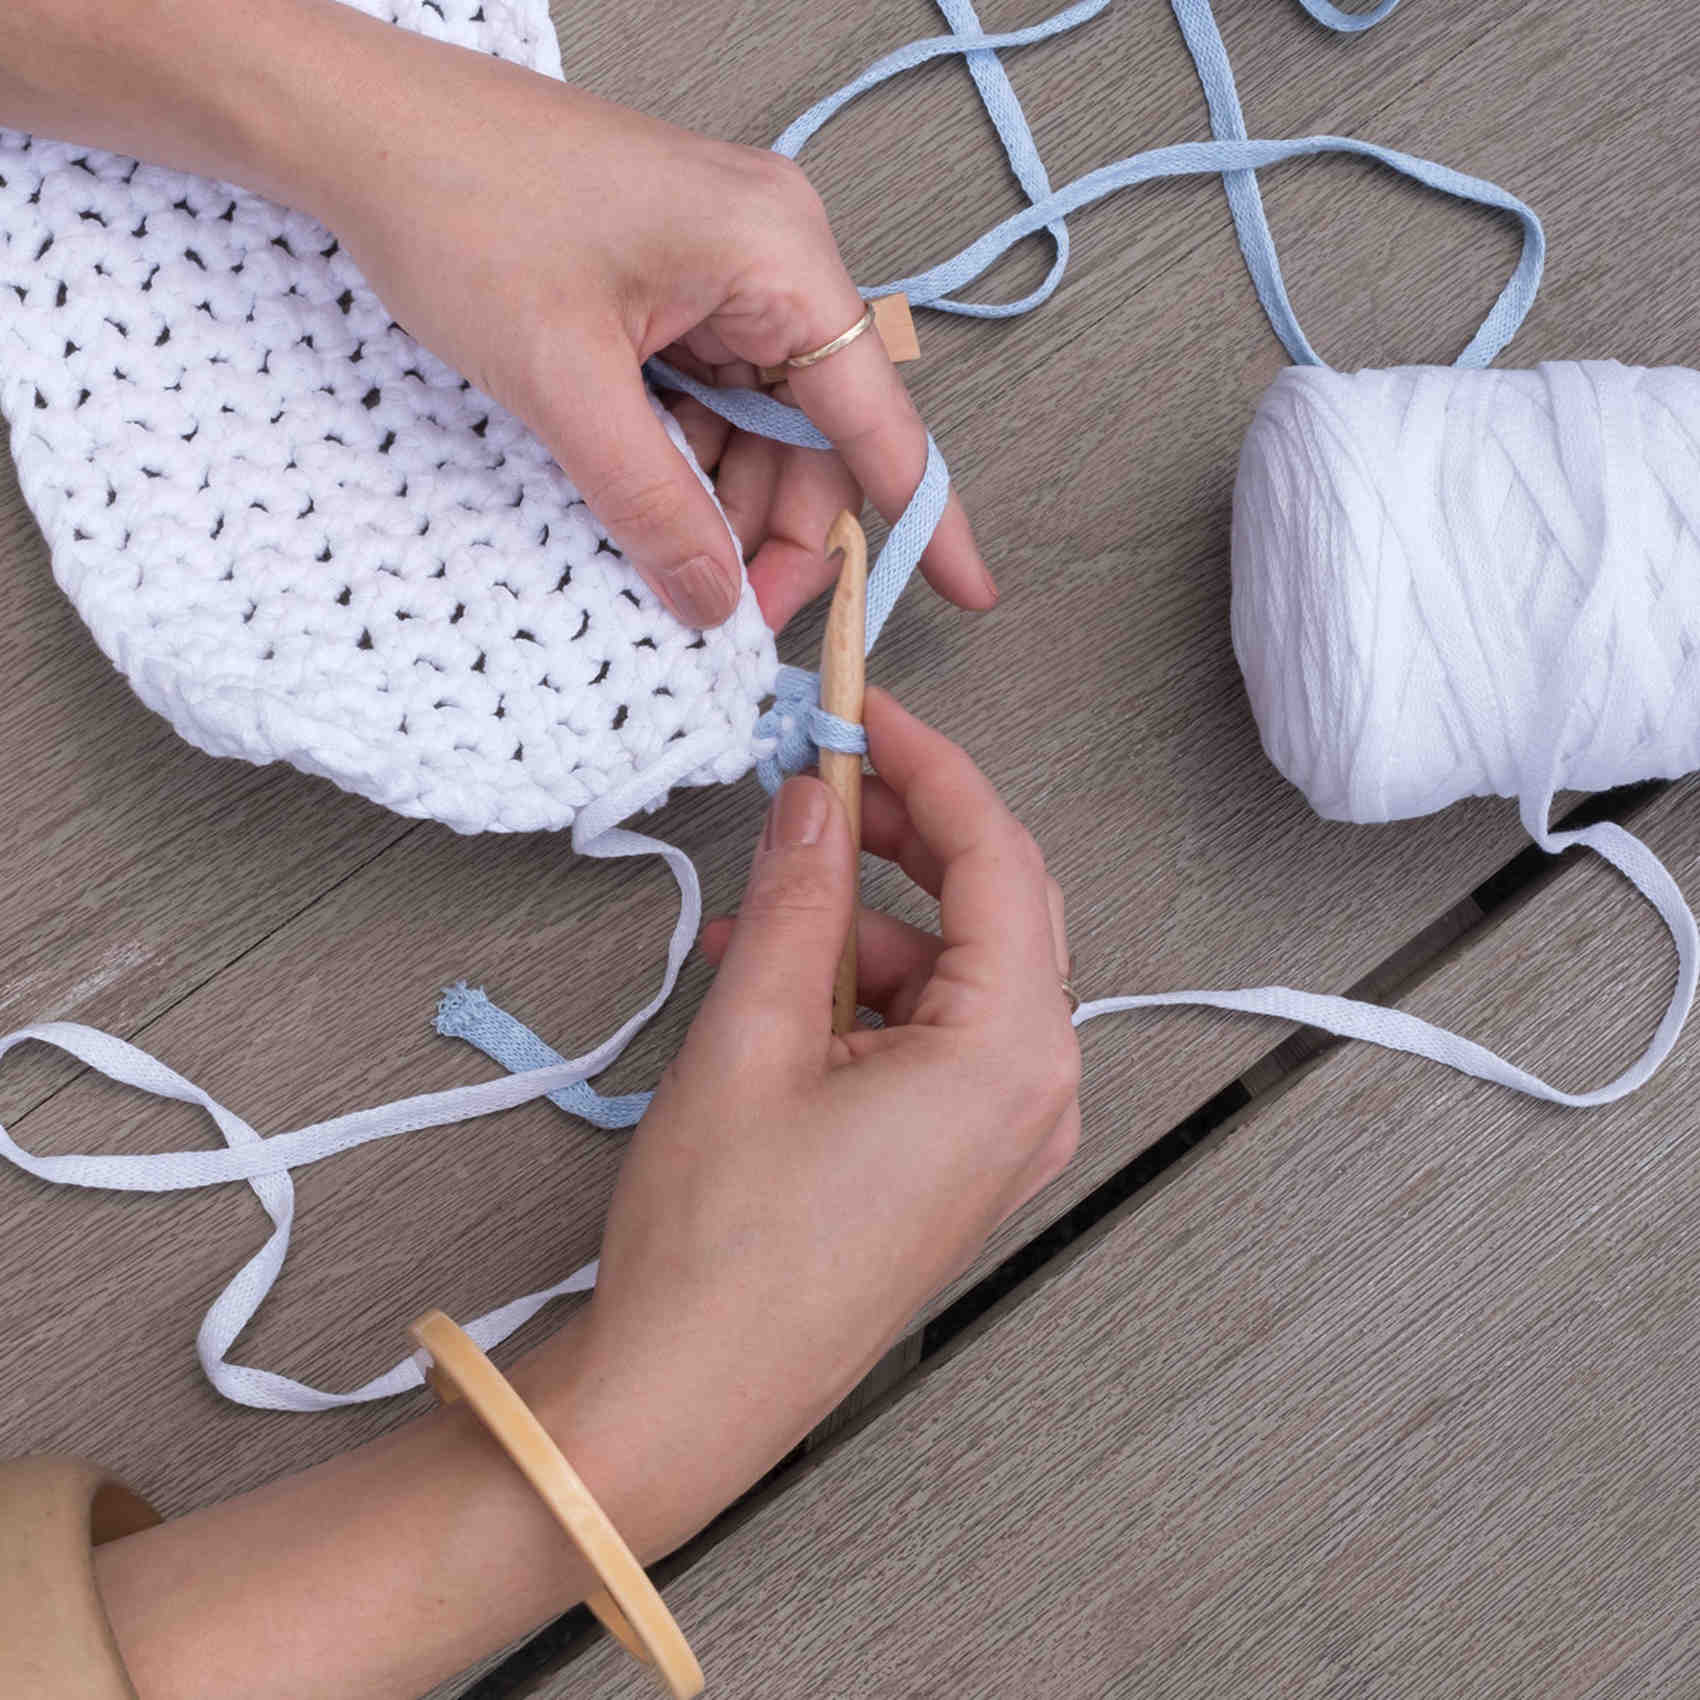 crocheted clutch tassel step 3b 0618 sq